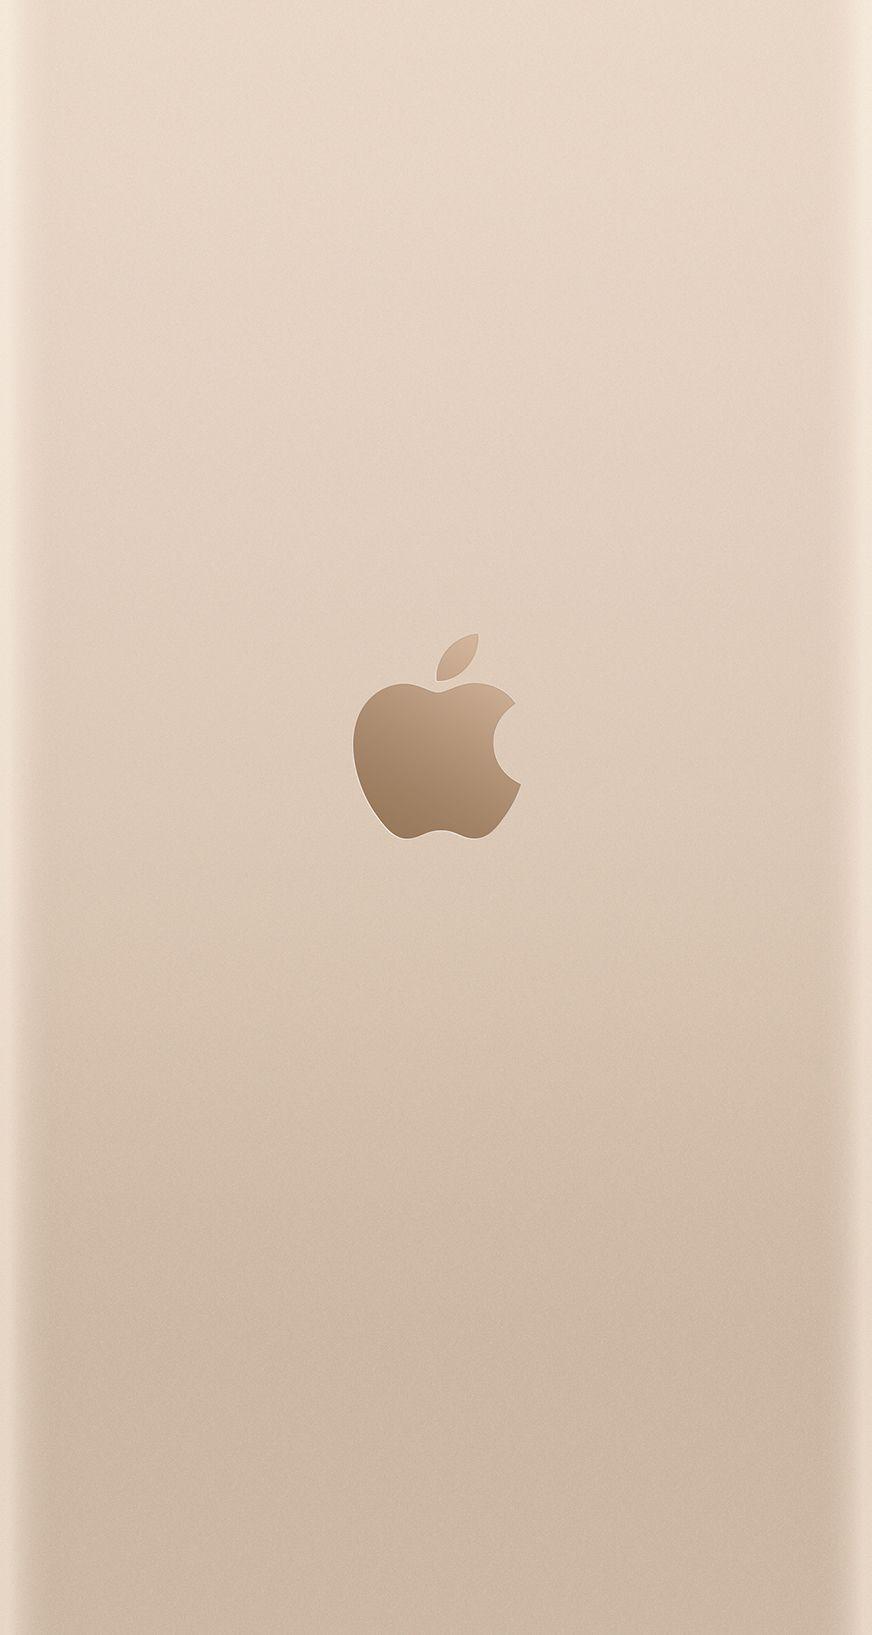 IPhone 6 Plus Wallpaper